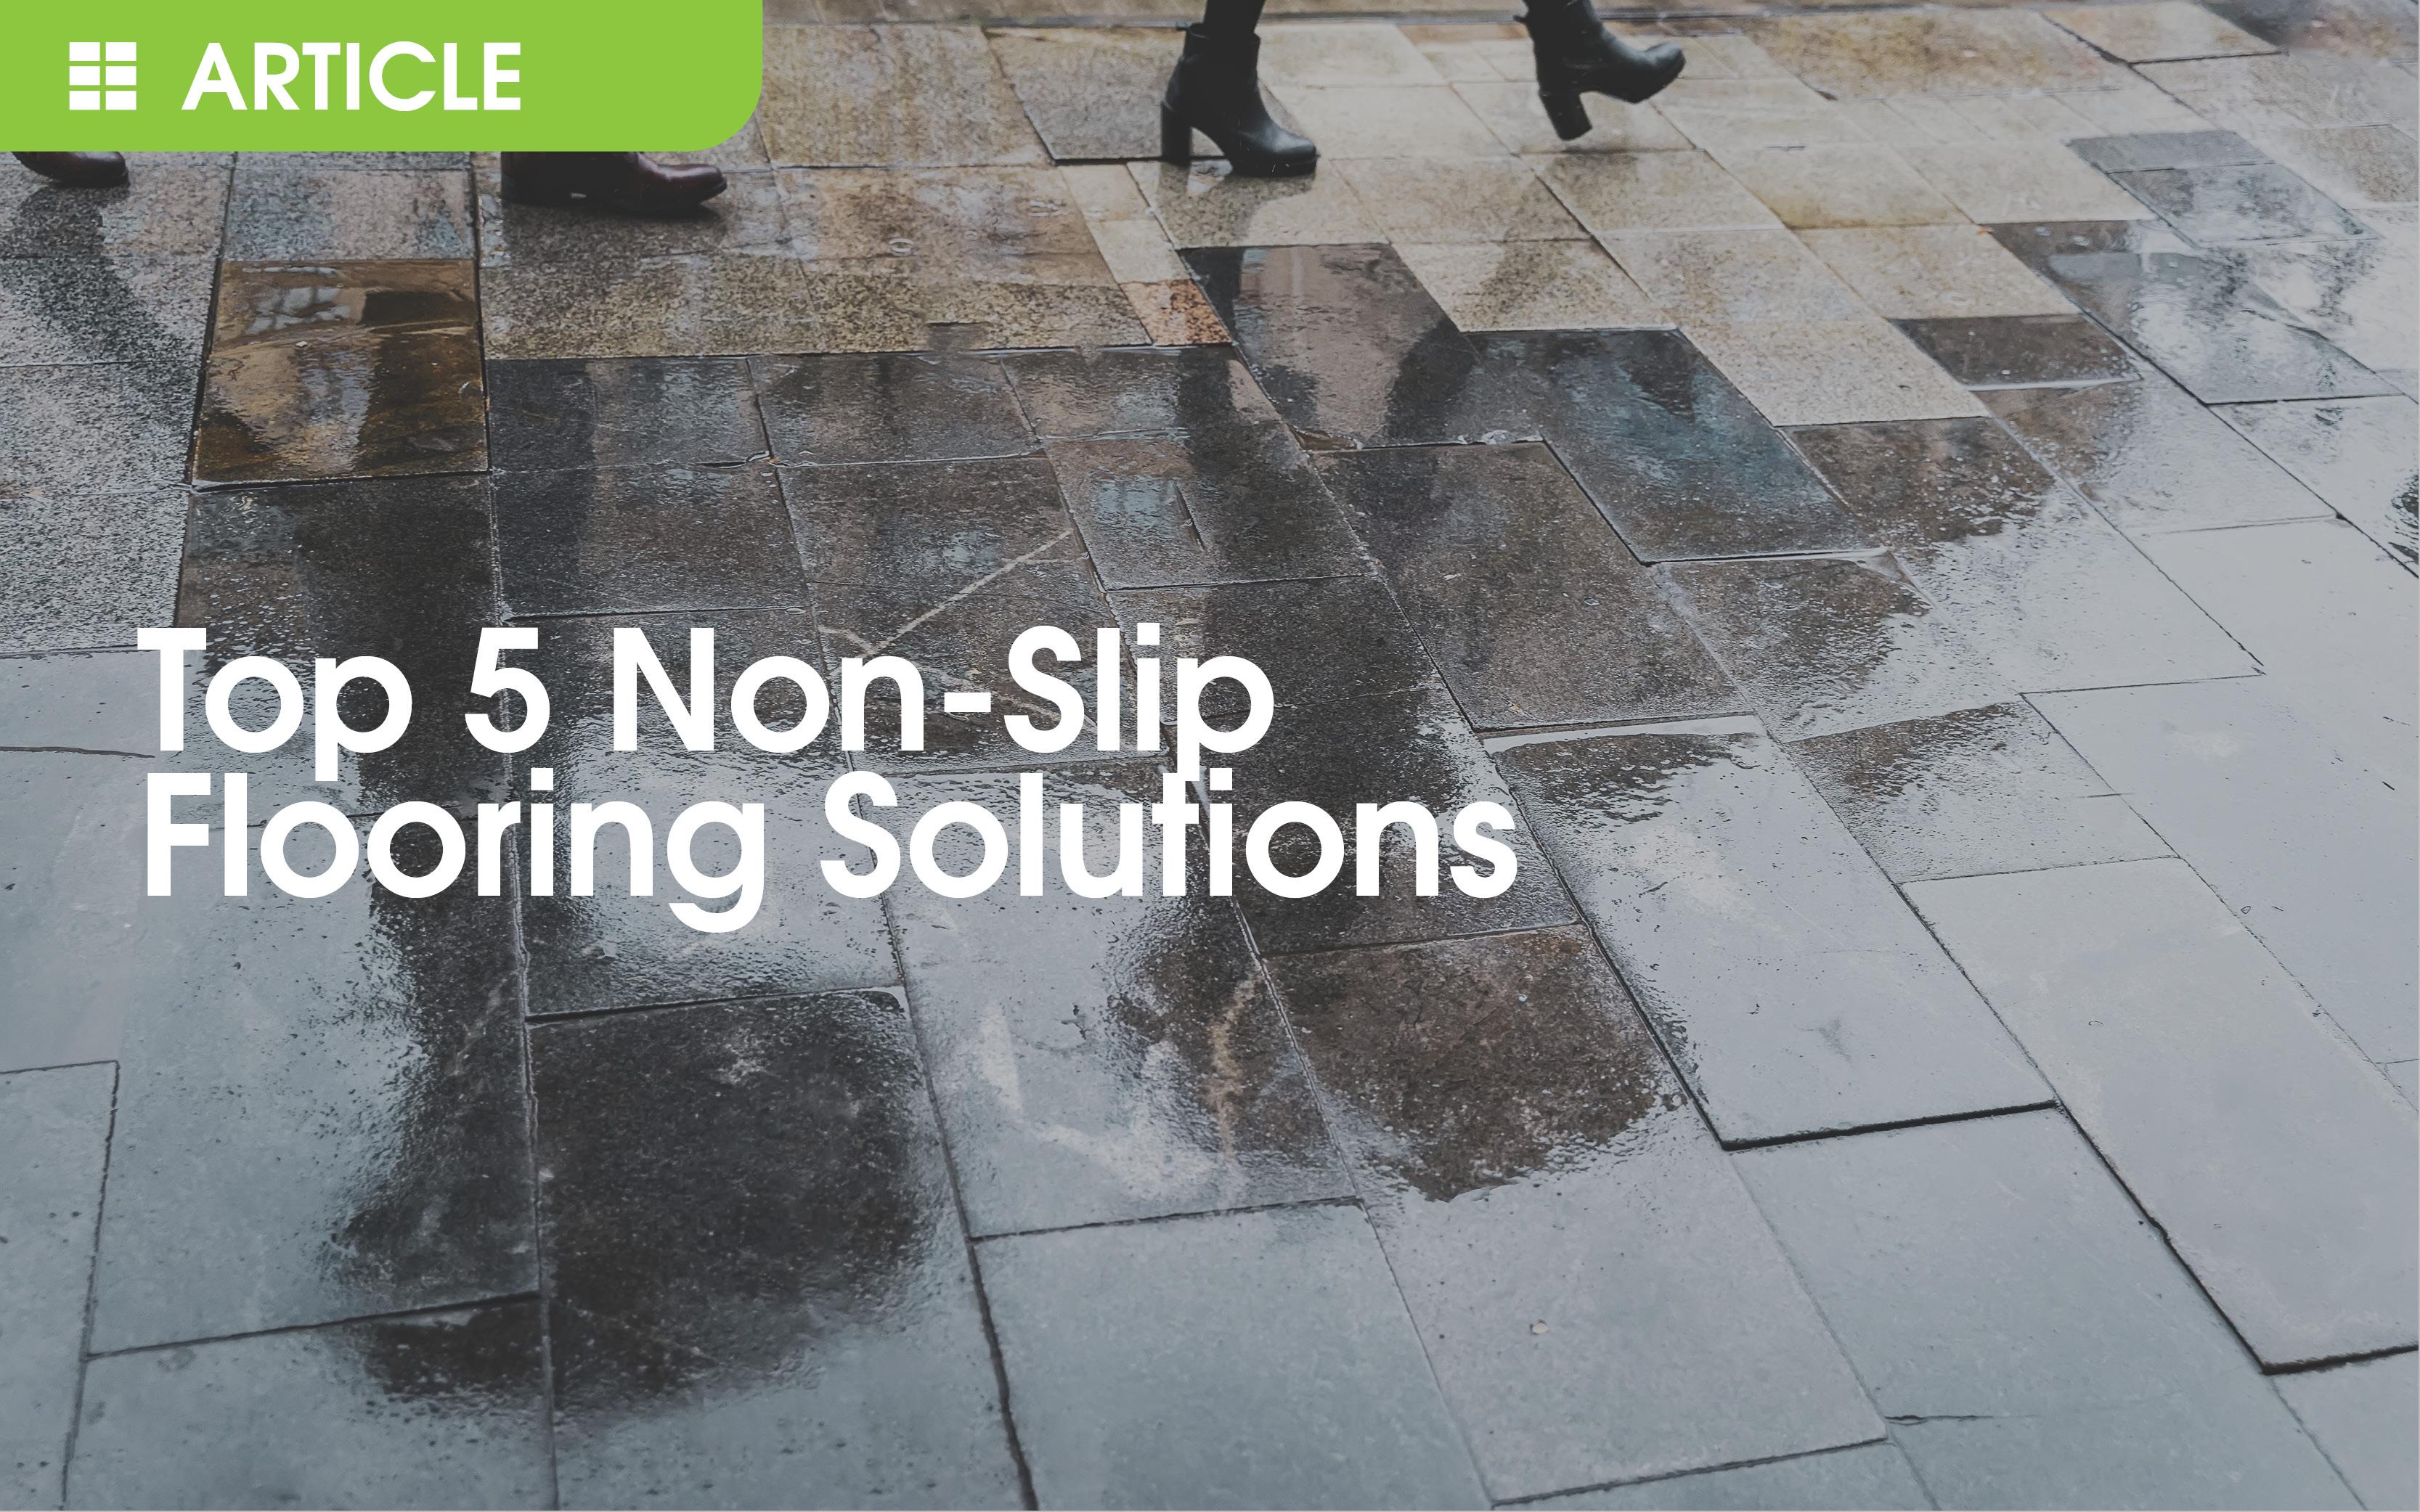 Top 5 Non-Slip flooring solutions